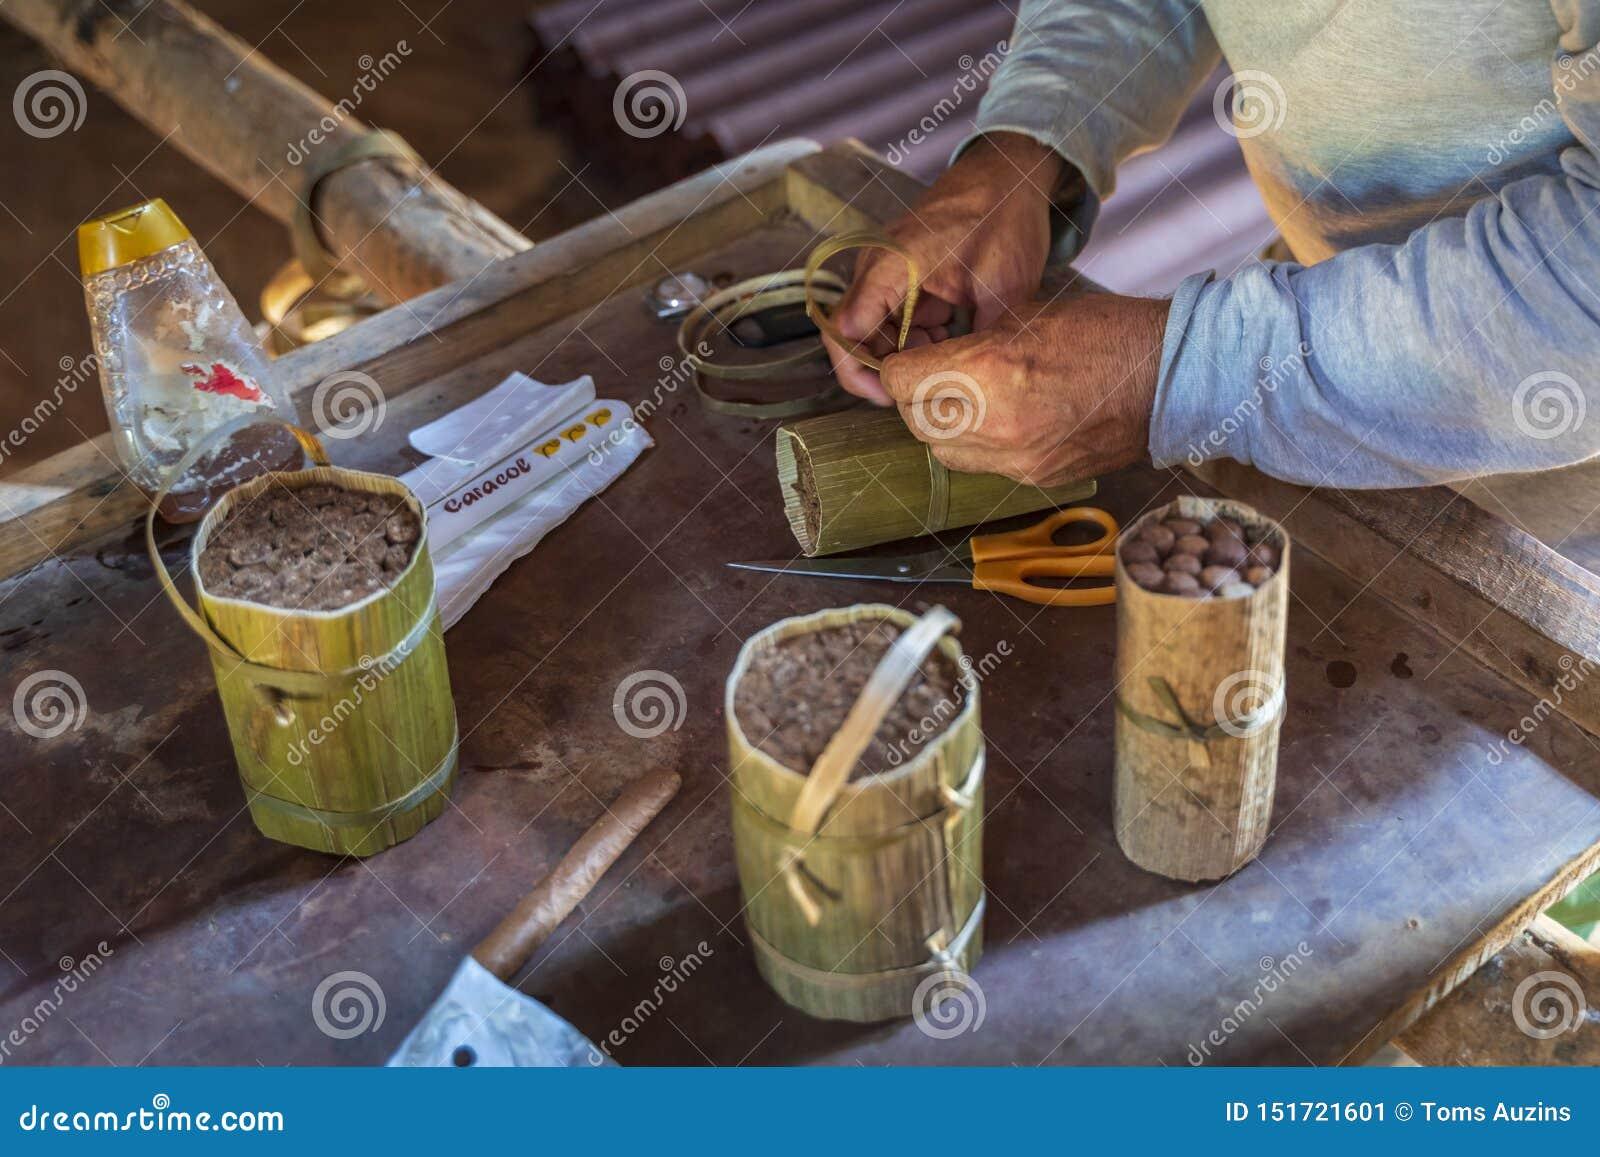 Sigarenvoorbereiding, Vinales, Unesco, Pinar del Rio Province, Cuba, de Antillen, de Caraïben, Midden-Amerika